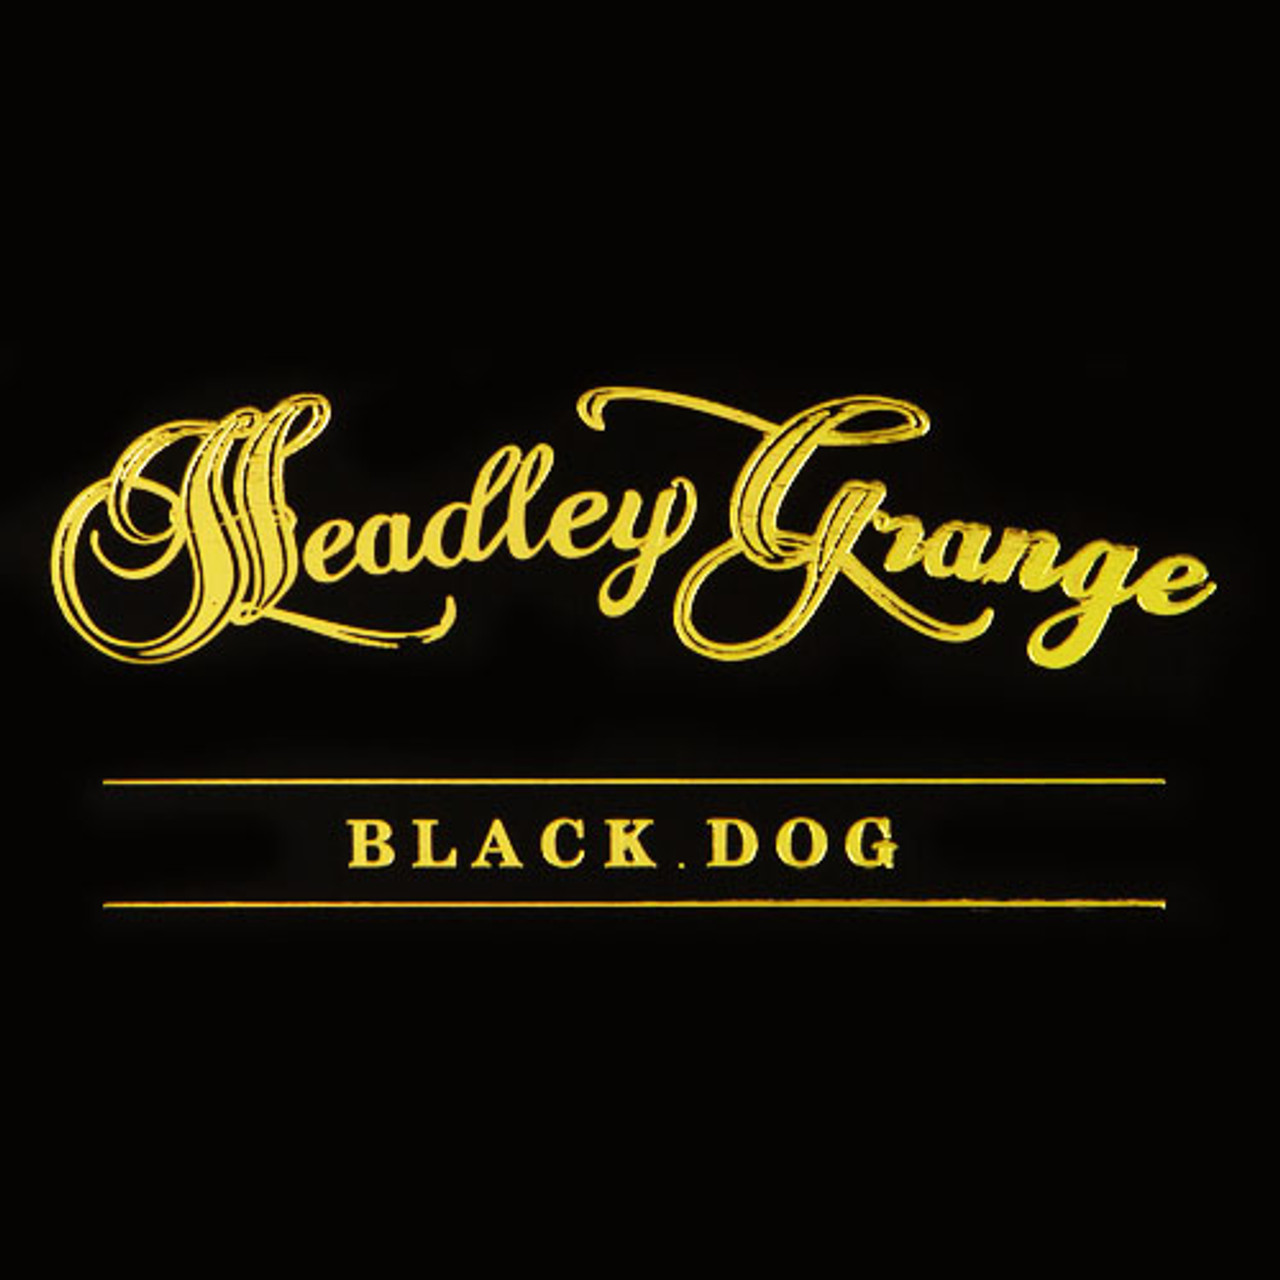 Headley Grange Black Dog Dobles Cigars - 6.12 x 50 (Box of 20)